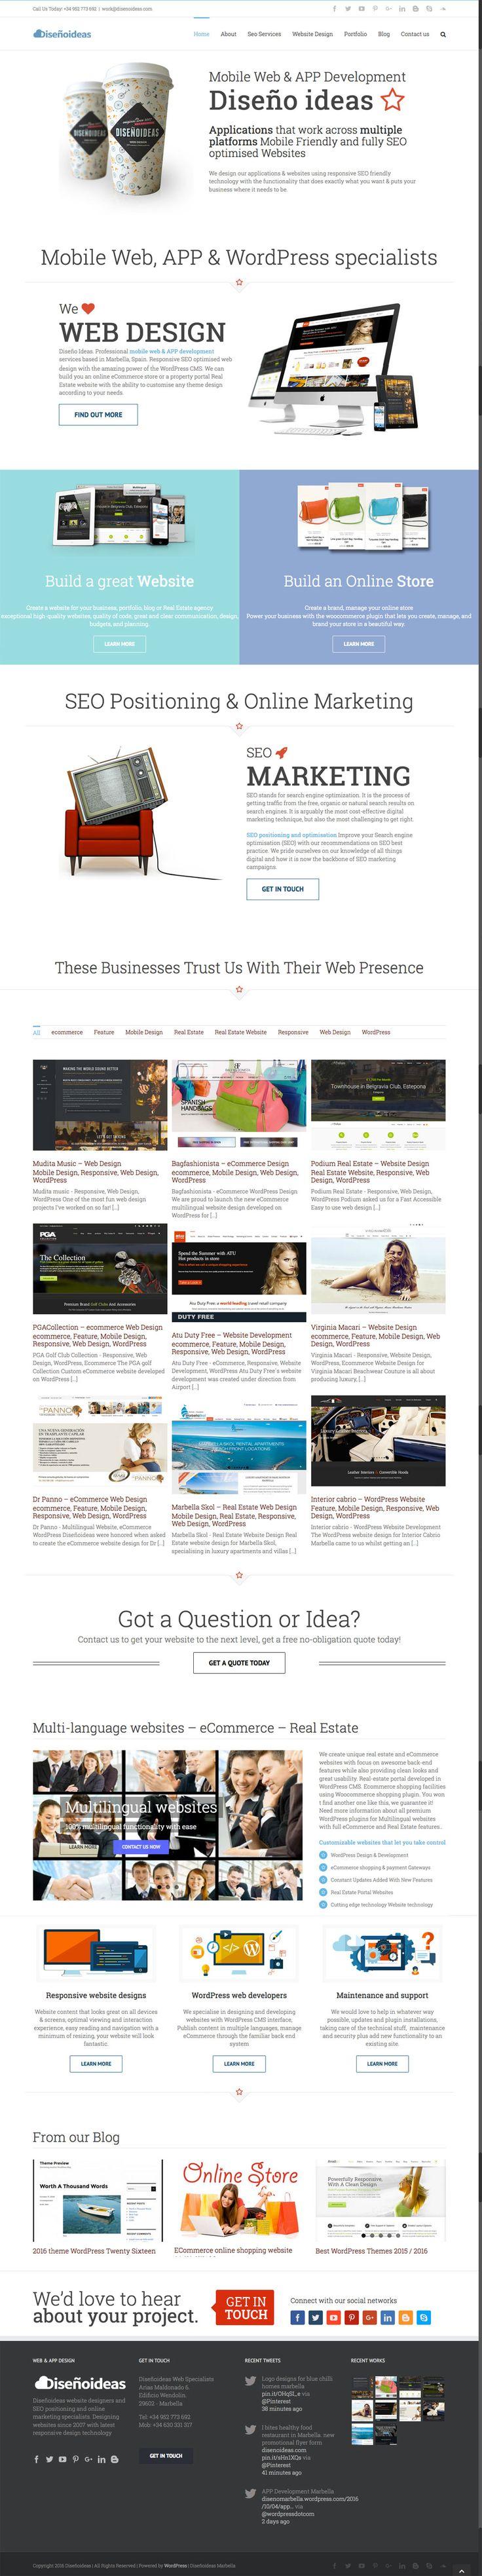 Mobile responsive website designers